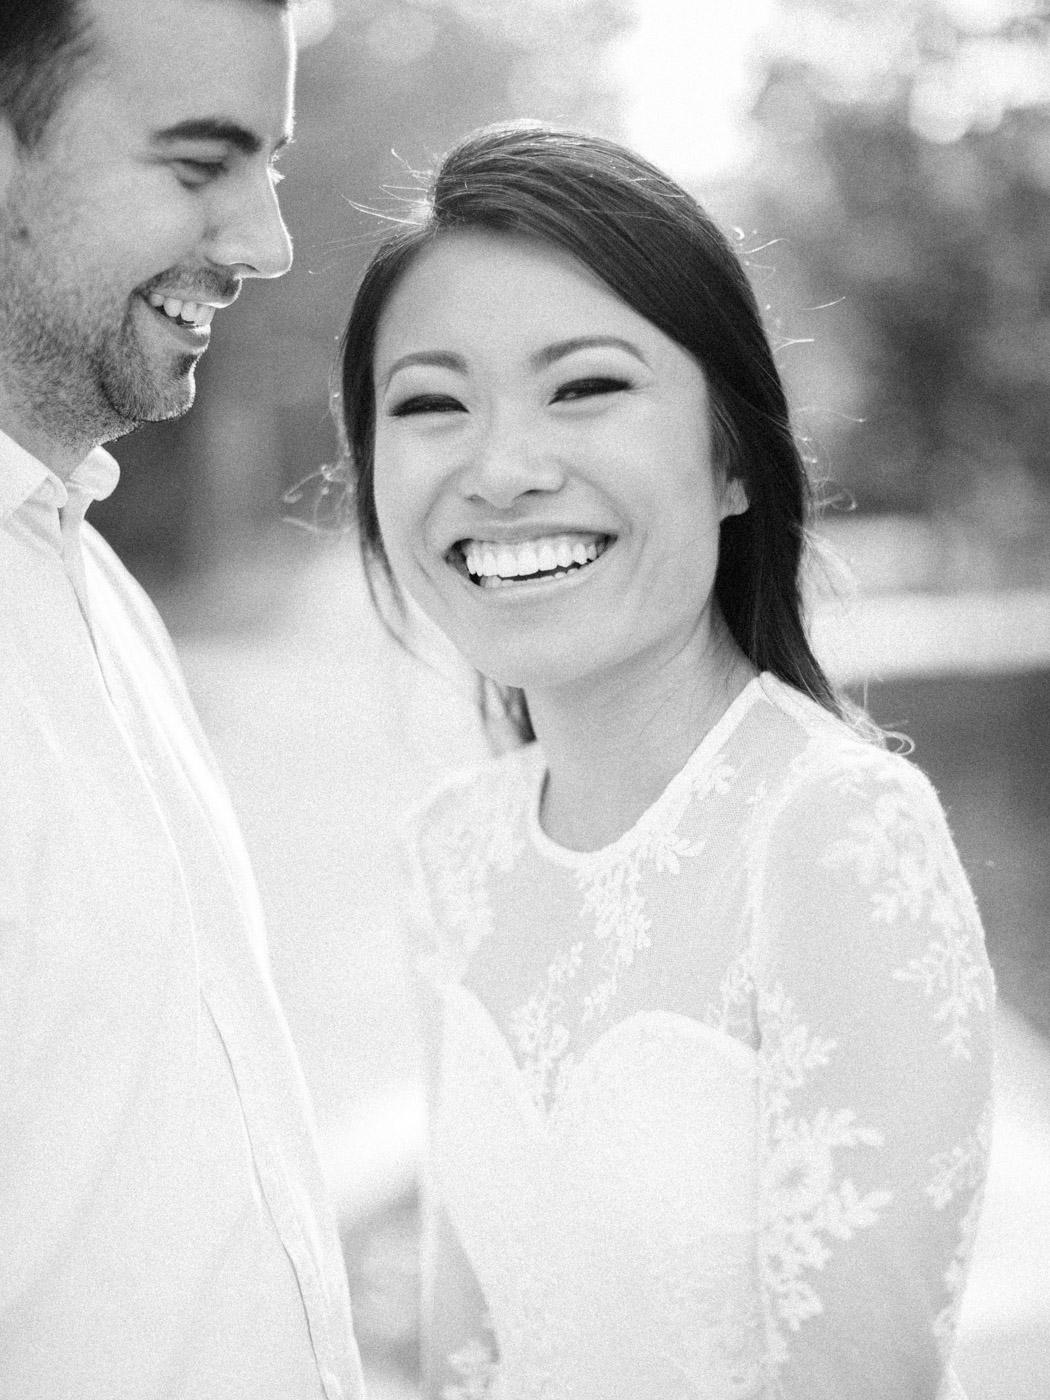 toronto_wedding_photographer_fine_art_documentary_Hamilton_Engagement_McMaster-48.jpg